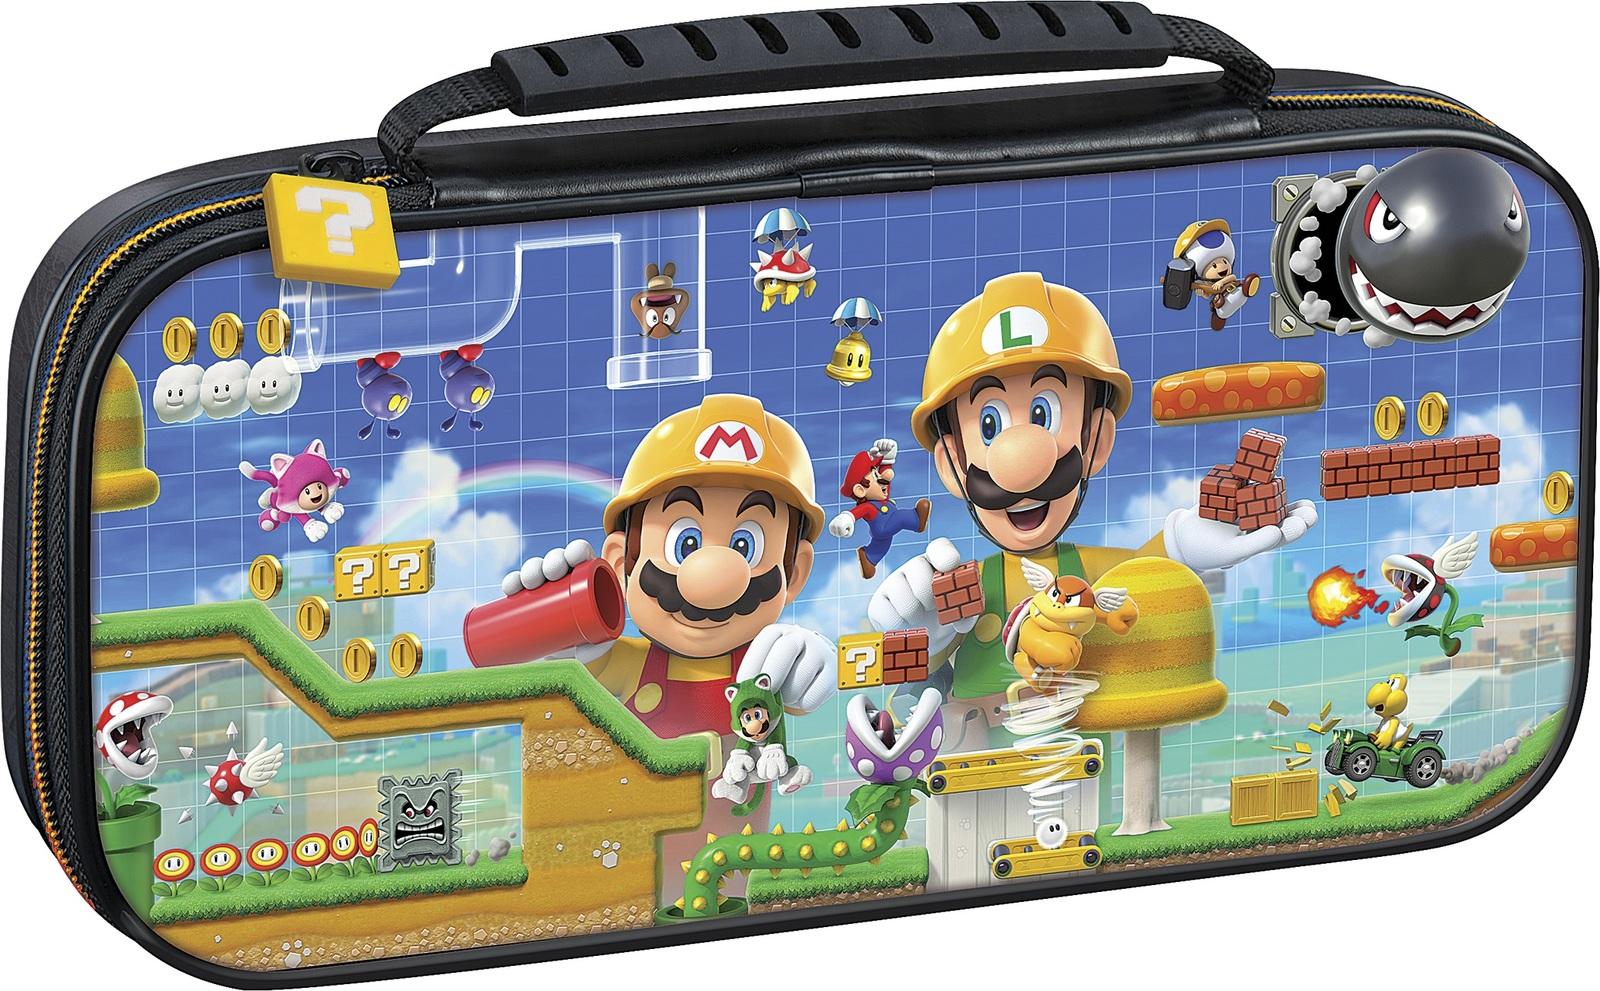 Etuit de Transport Super Mario Maker Nintendo Switch